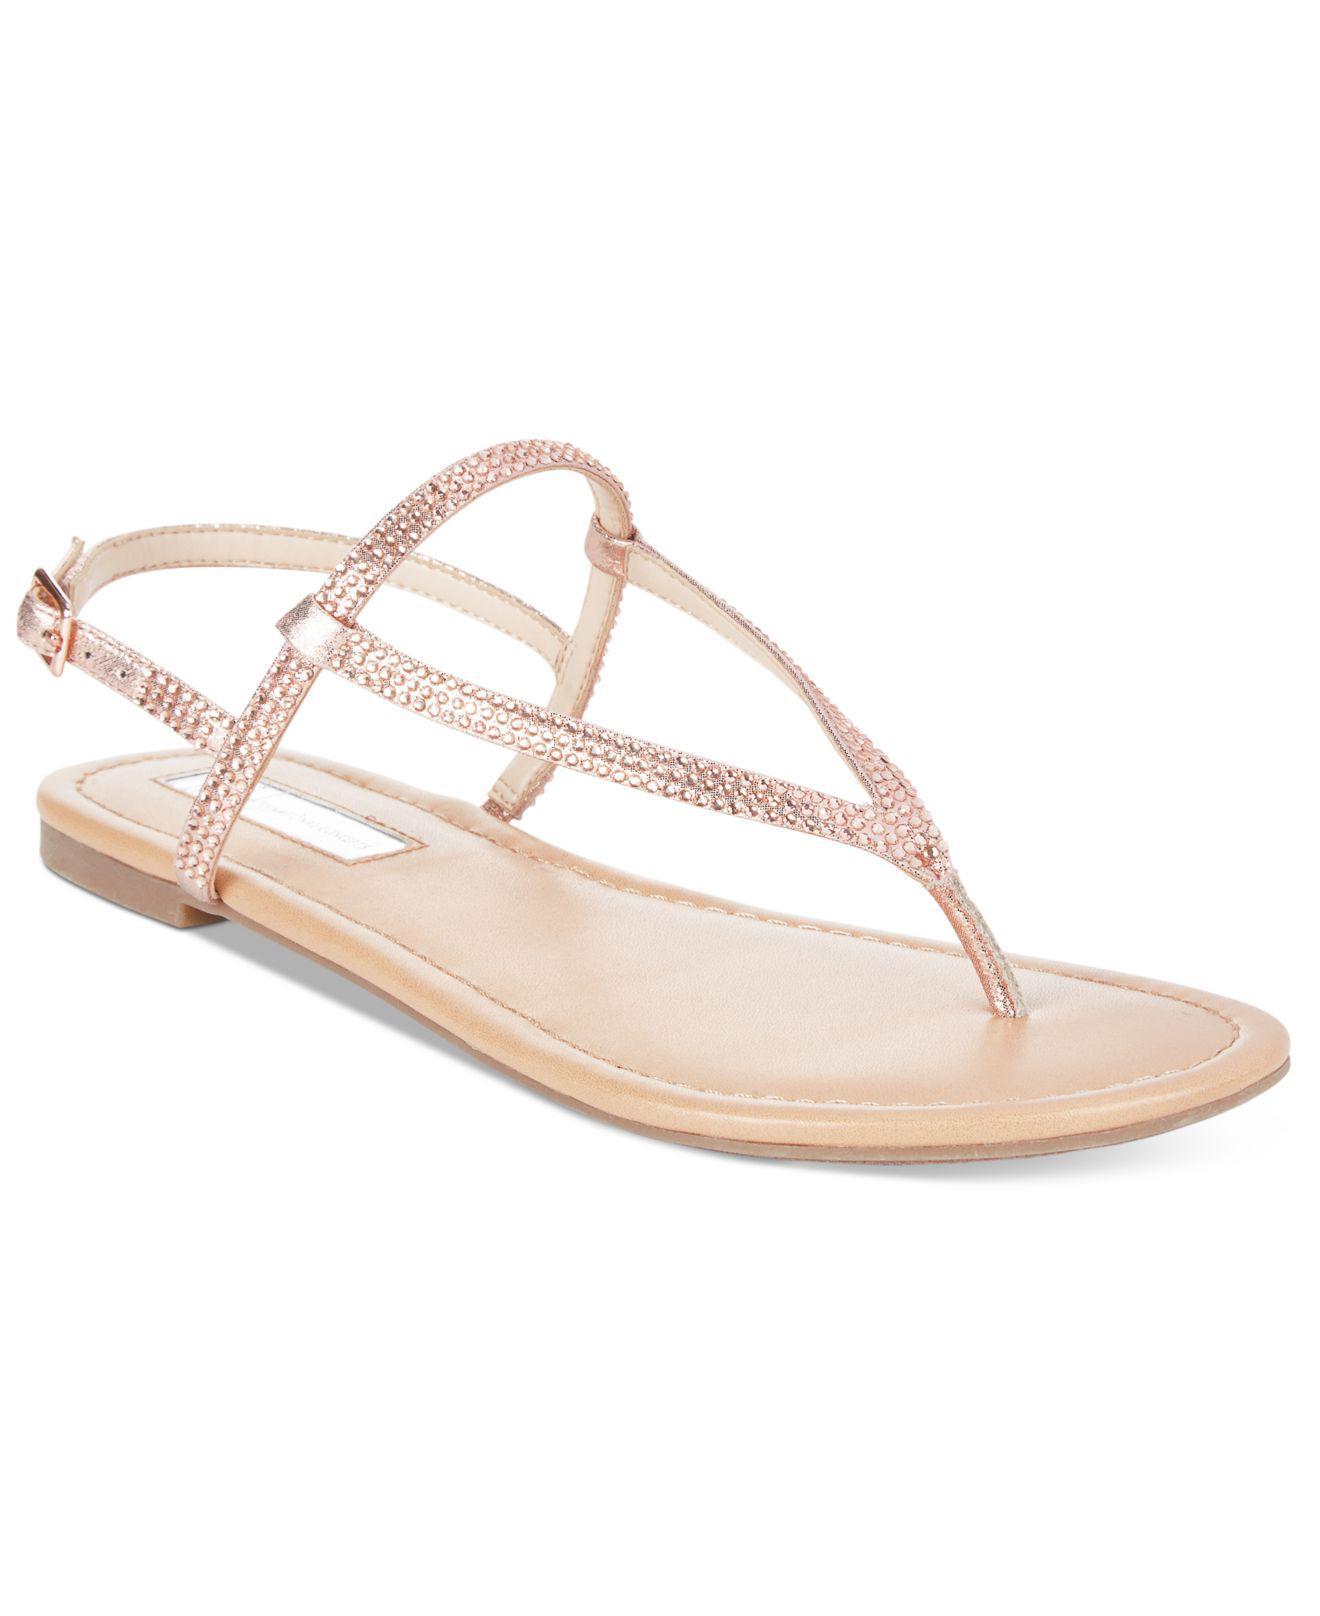 a20ffbd1b7a73e INC International Concepts. Women s Macawi Embellished Flat Sandals ...